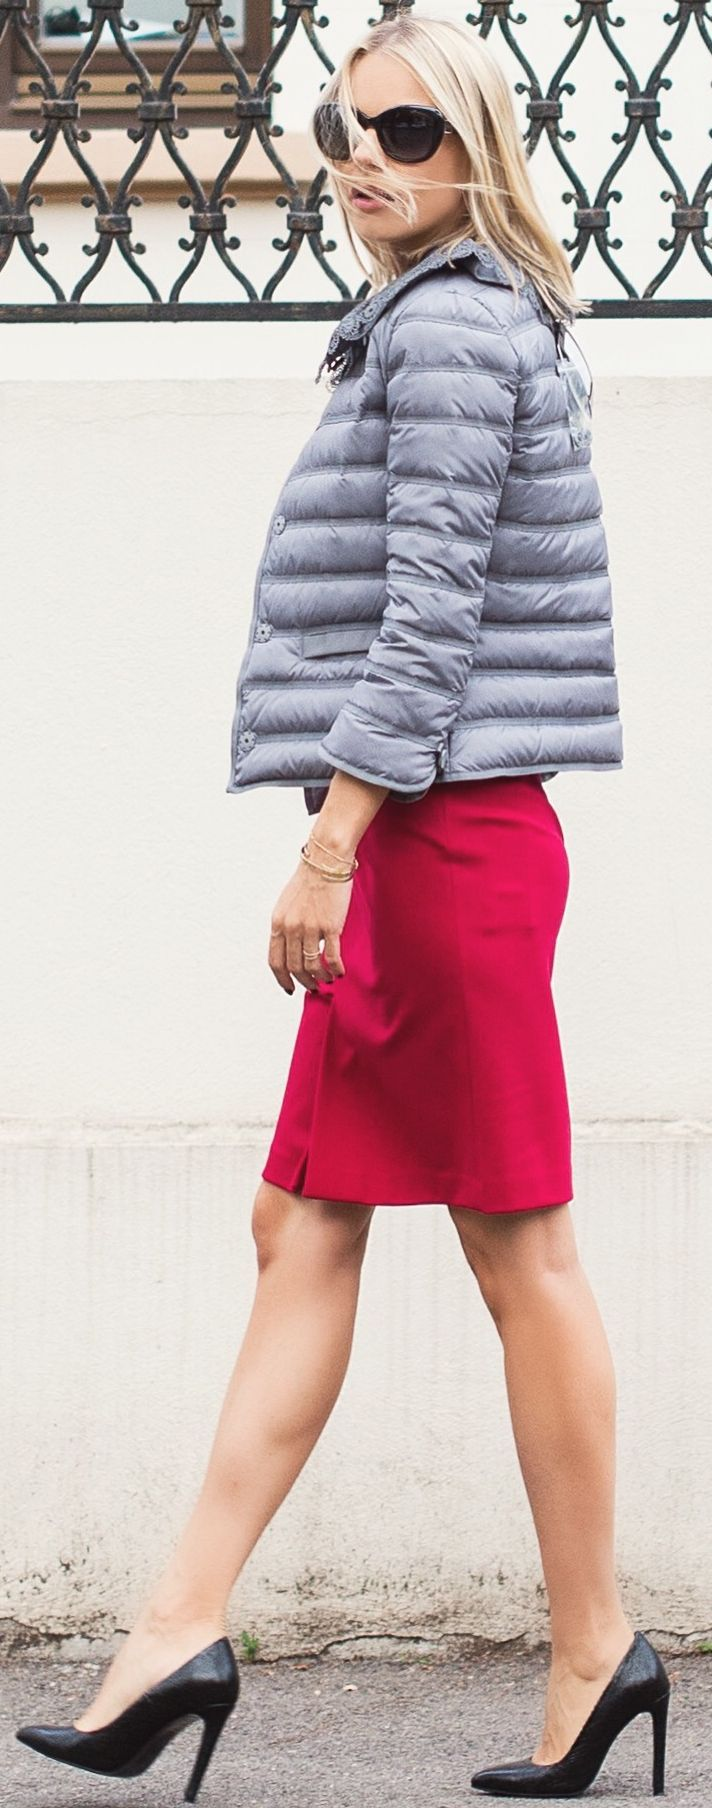 Catalina Grama Black Heels Red Skirt Grey Lace Collar Puffer Jacket Fall Inspo #Fashionistas